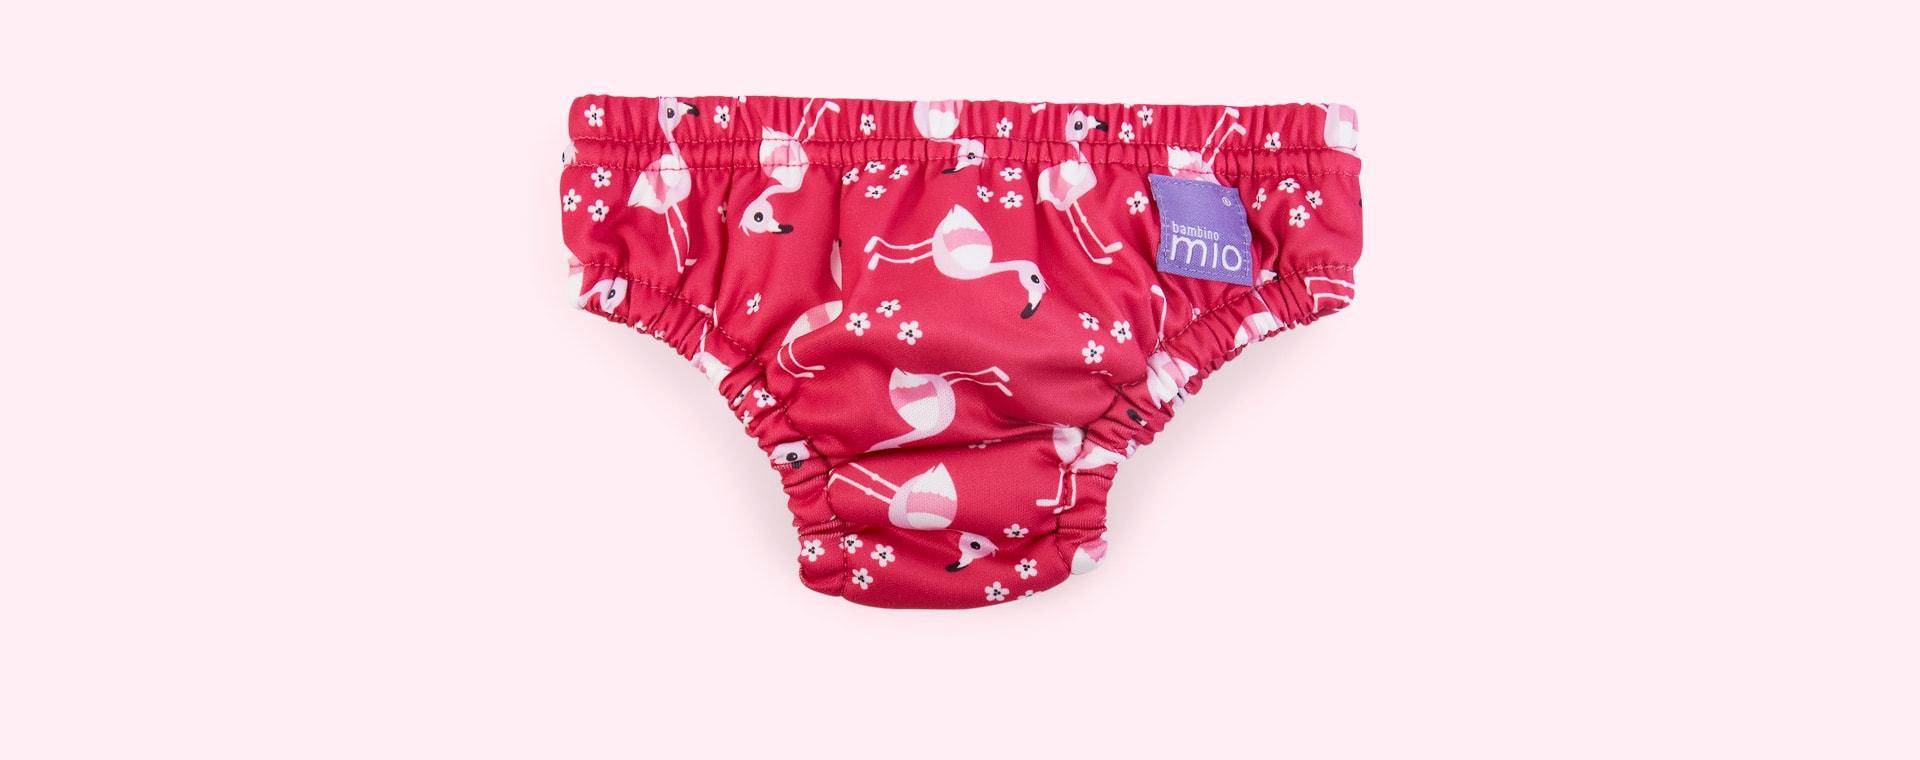 Flamingo Bambino Mio Reusable Swim Nappy